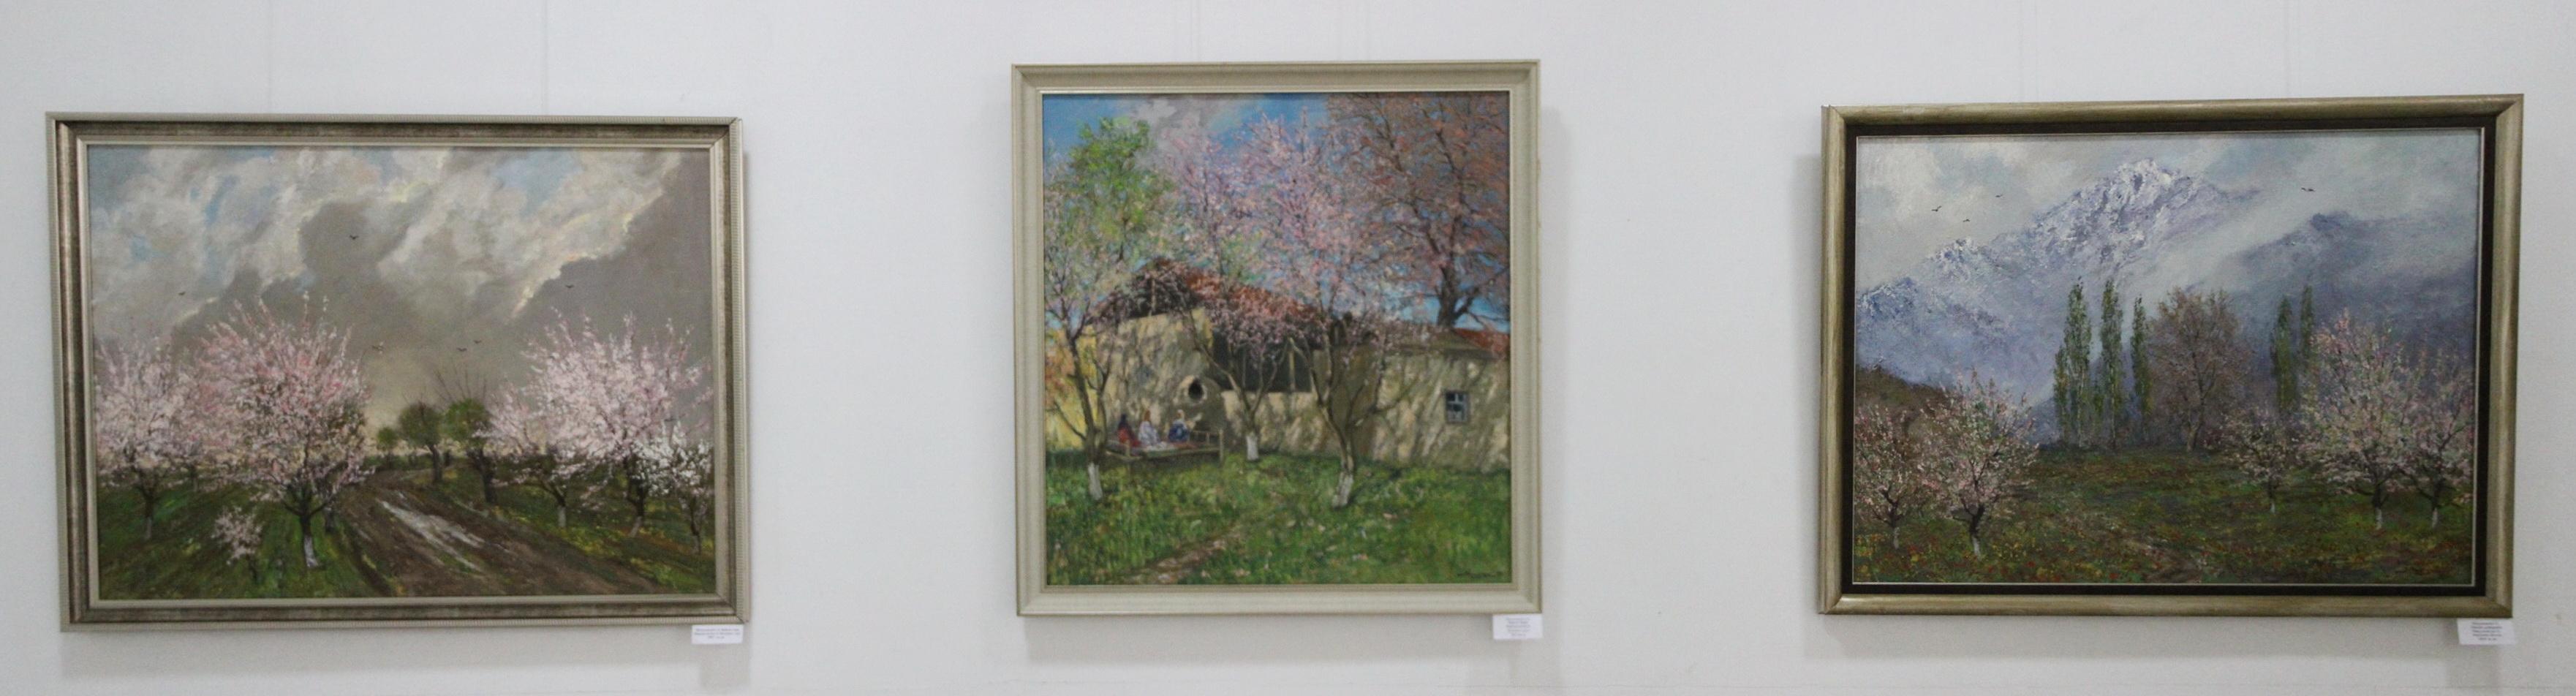 Мирзахмедов Хаким. Экспозиция картин.